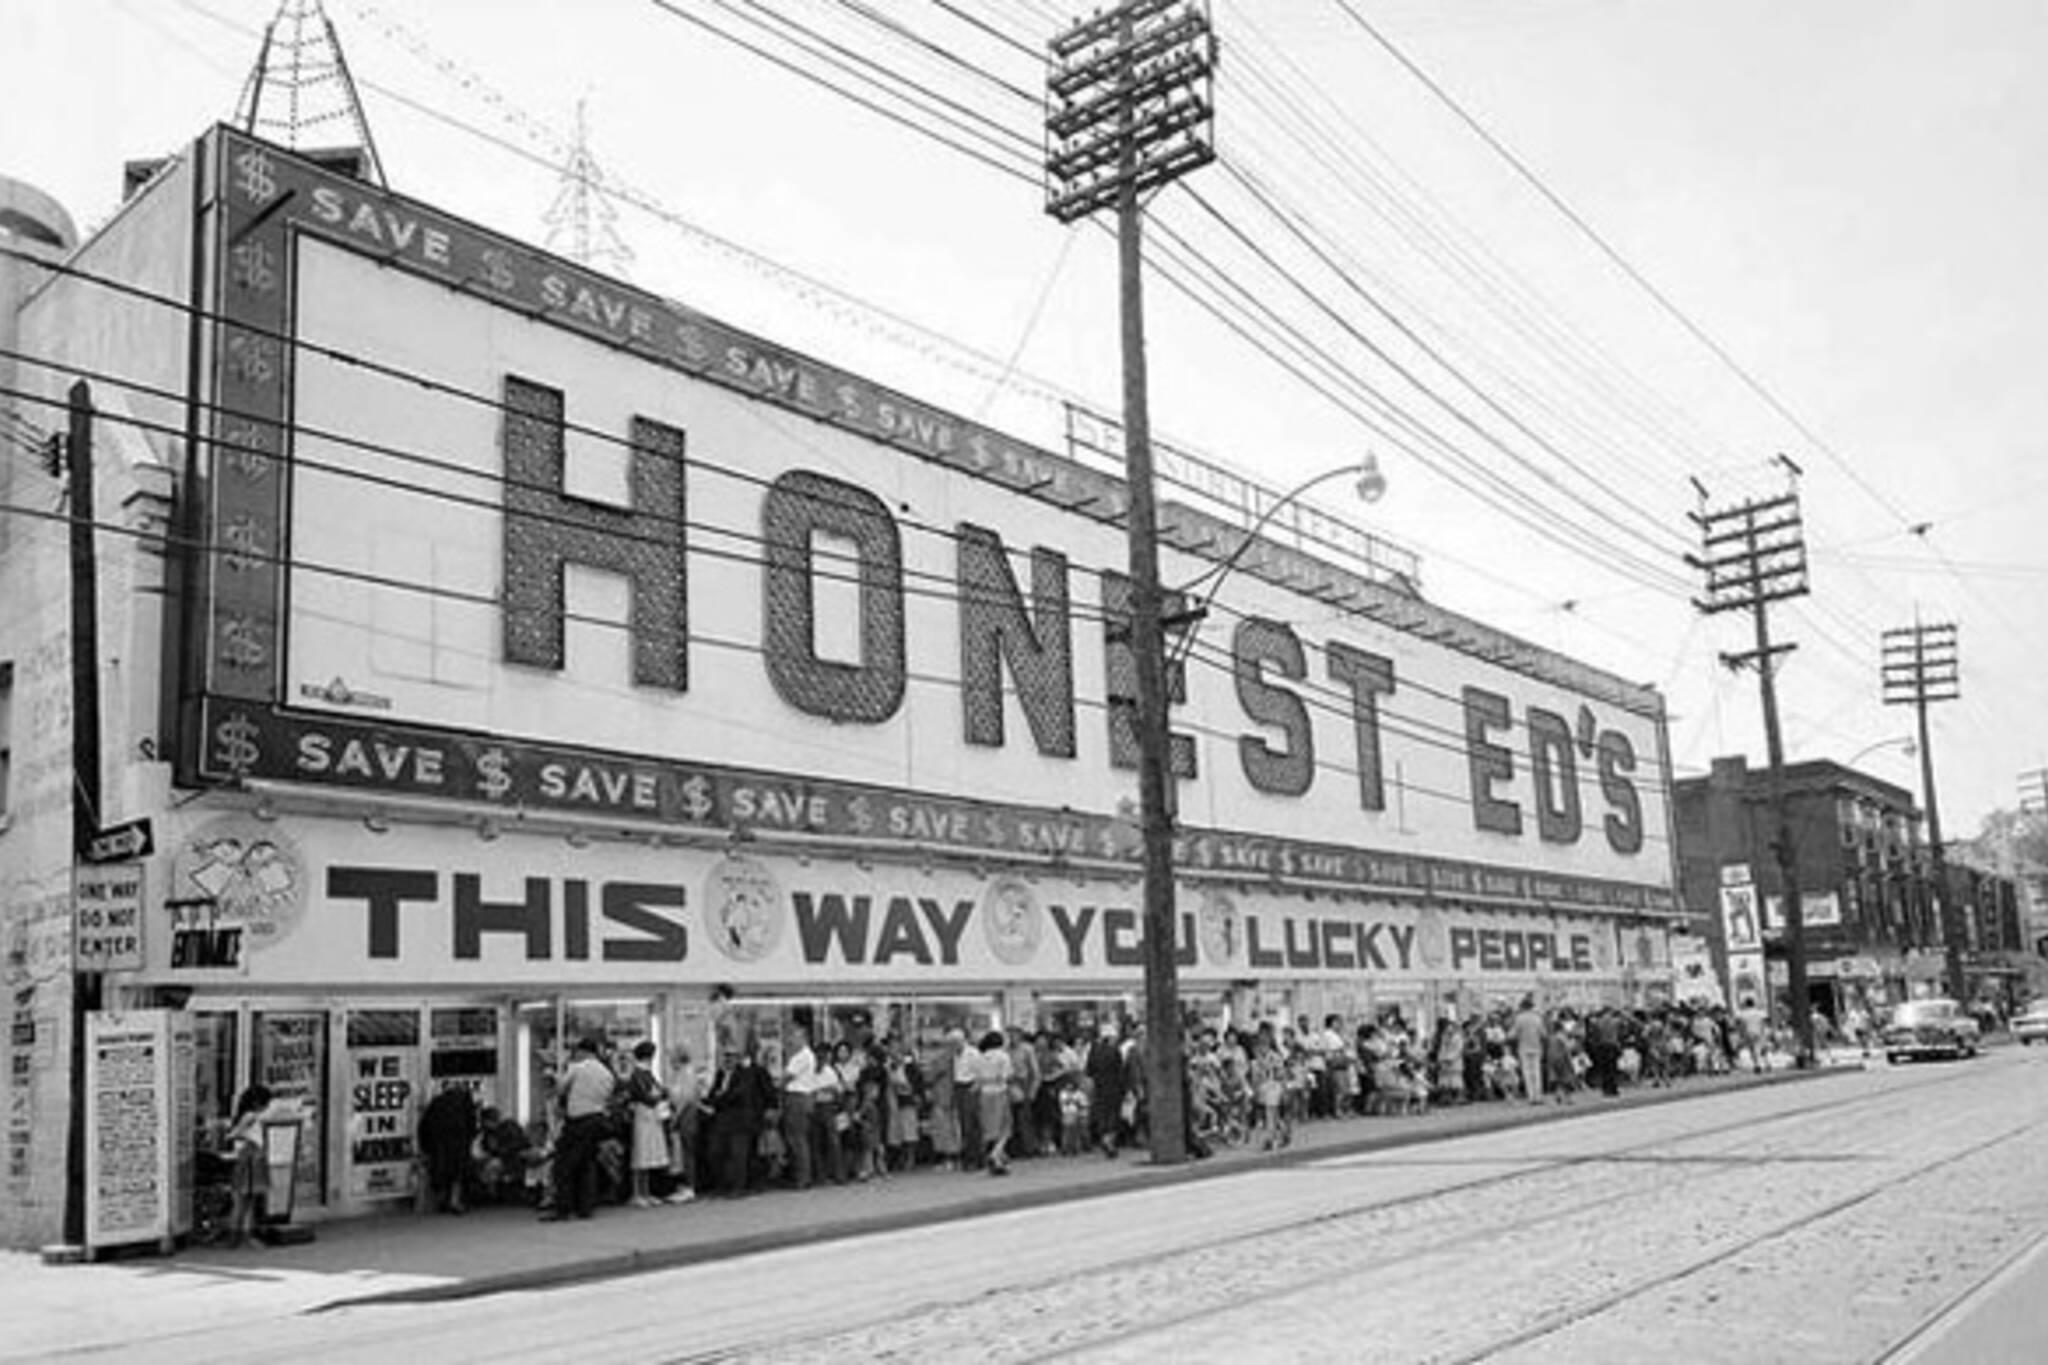 Vintage Signage Honest Ed's Toronto